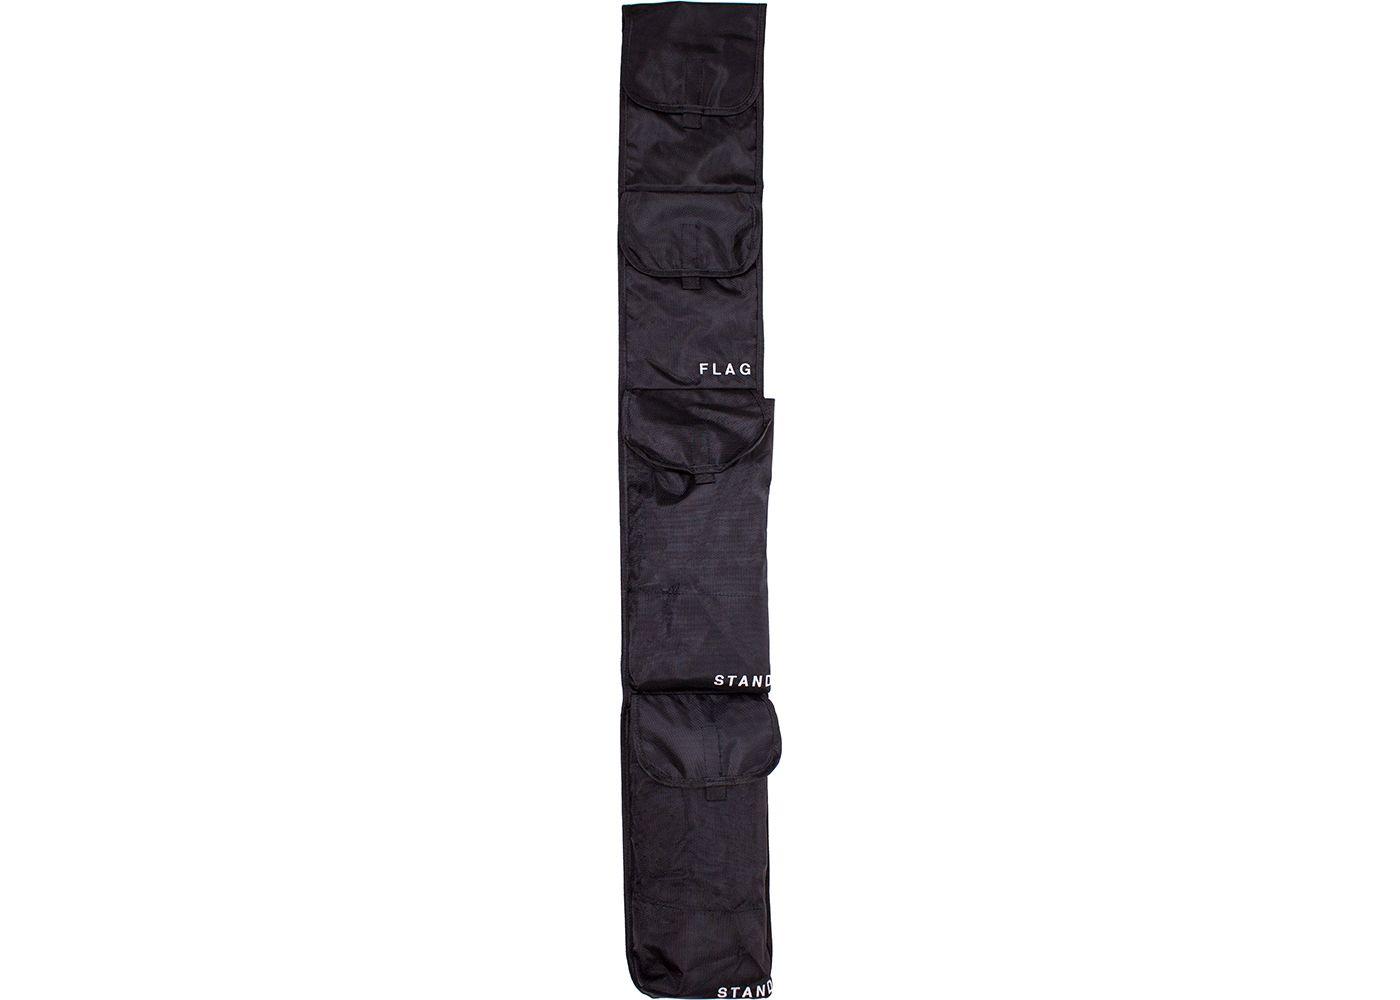 Flagpole-To-Go Storage Bag